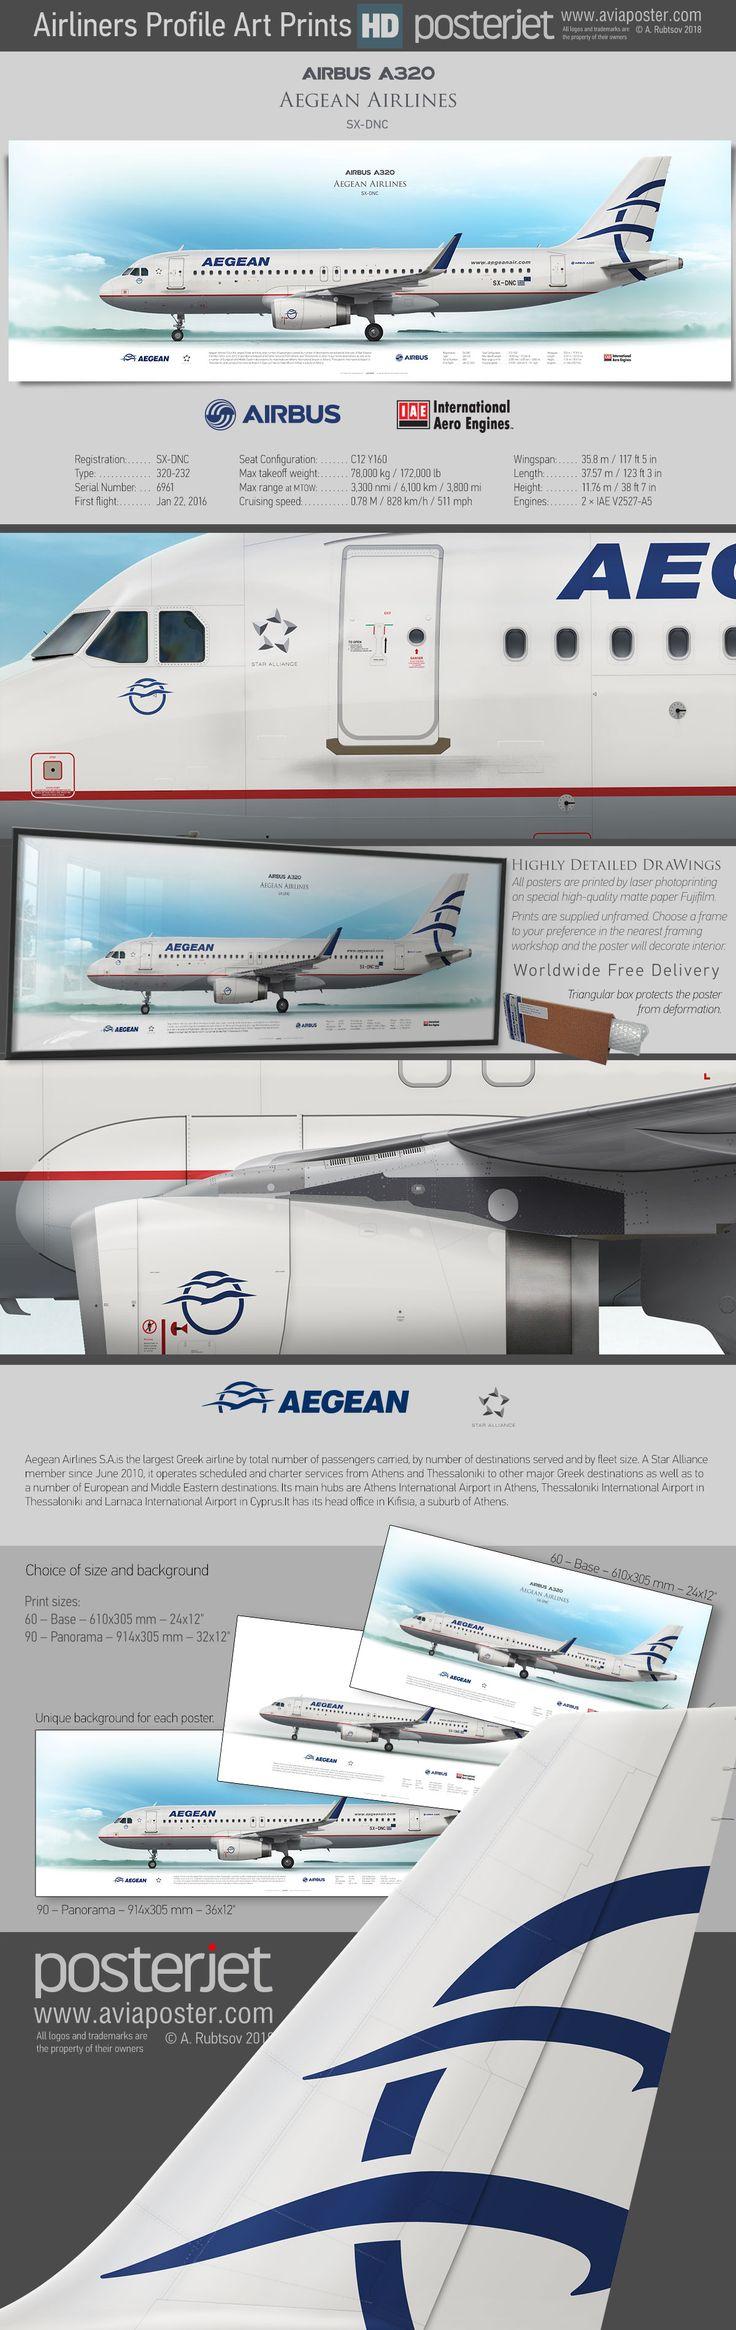 Airbus A320 Aegean Airlines SX-DNC   www.aviaposter.com   #aviation #jetliner #airplane #pilot #aviationlovers #avgeek #jet #airport #pilotlife #cabincrew